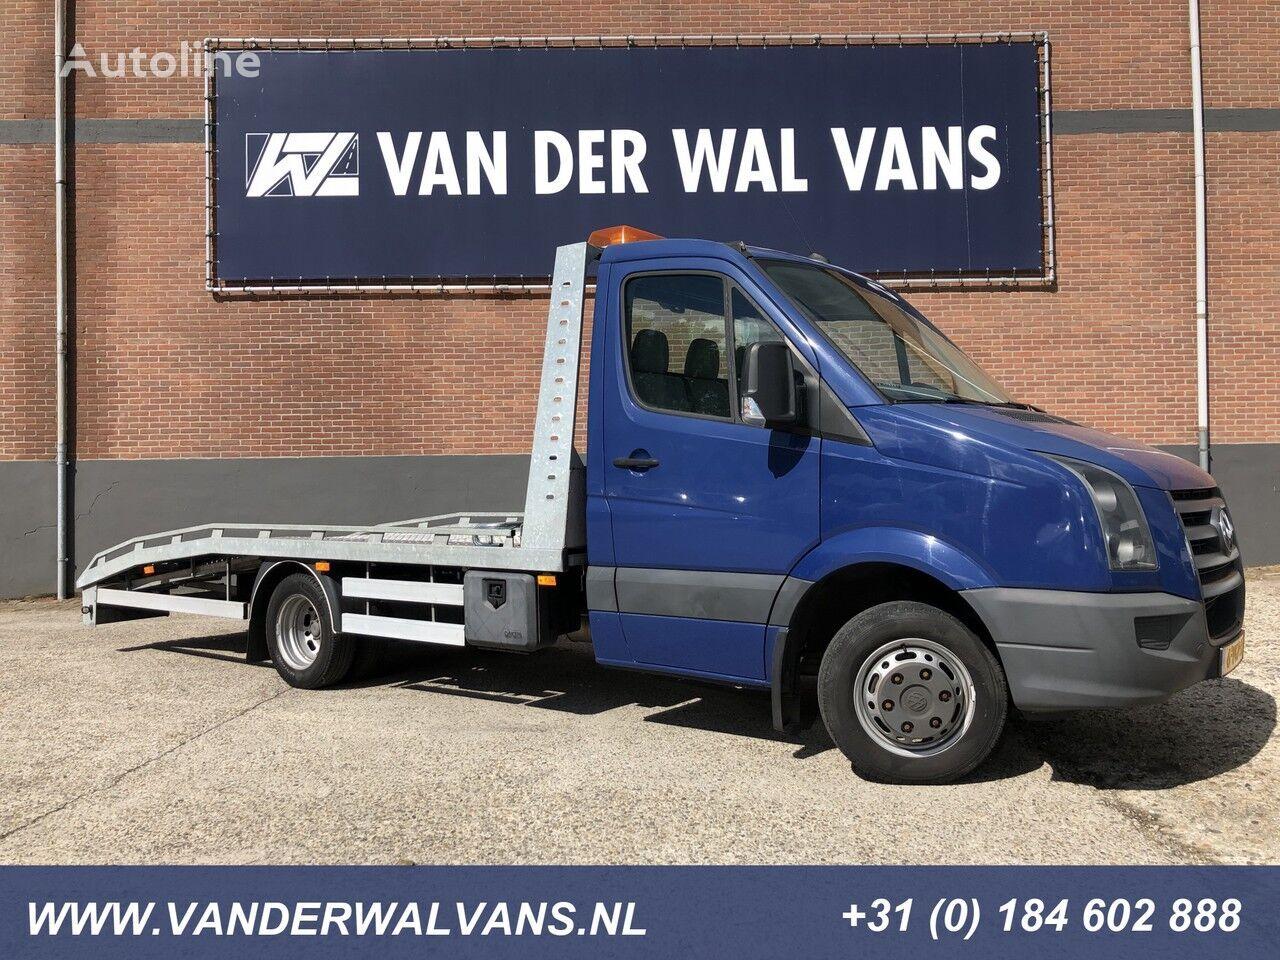 VOLKSWAGEN Crafter 50 2.5TDI 164pk Oprijwagen Airco, lier, trekhaak camión portacoches